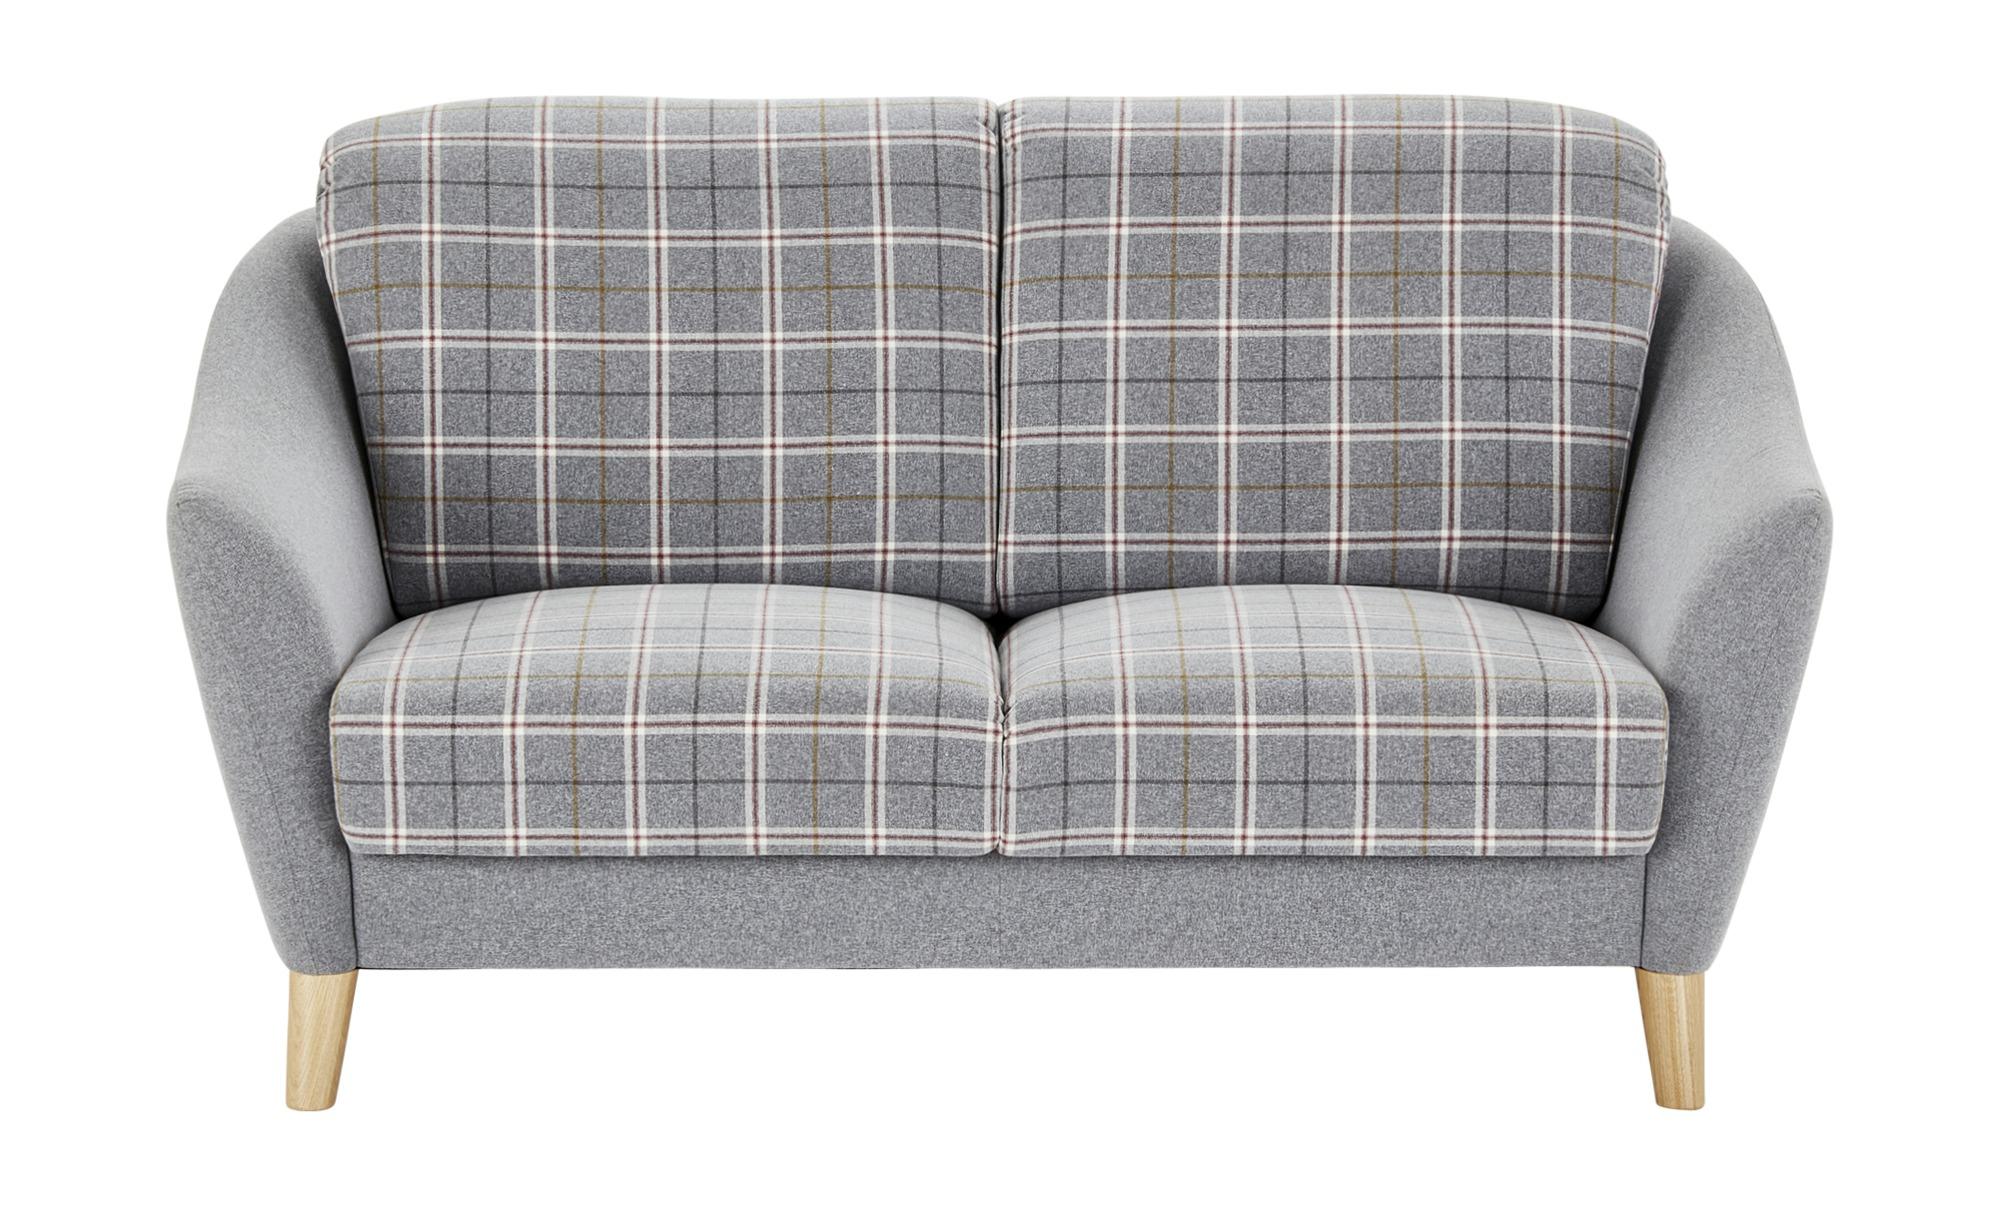 Sofa 2-sitzig grau - Webstoff Seefeld-Plus ¦ grau ¦ Maße (cm): B: 162 H: 92 T: 91 Polstermöbel > Sofas > 2-Sitzer - Höffner